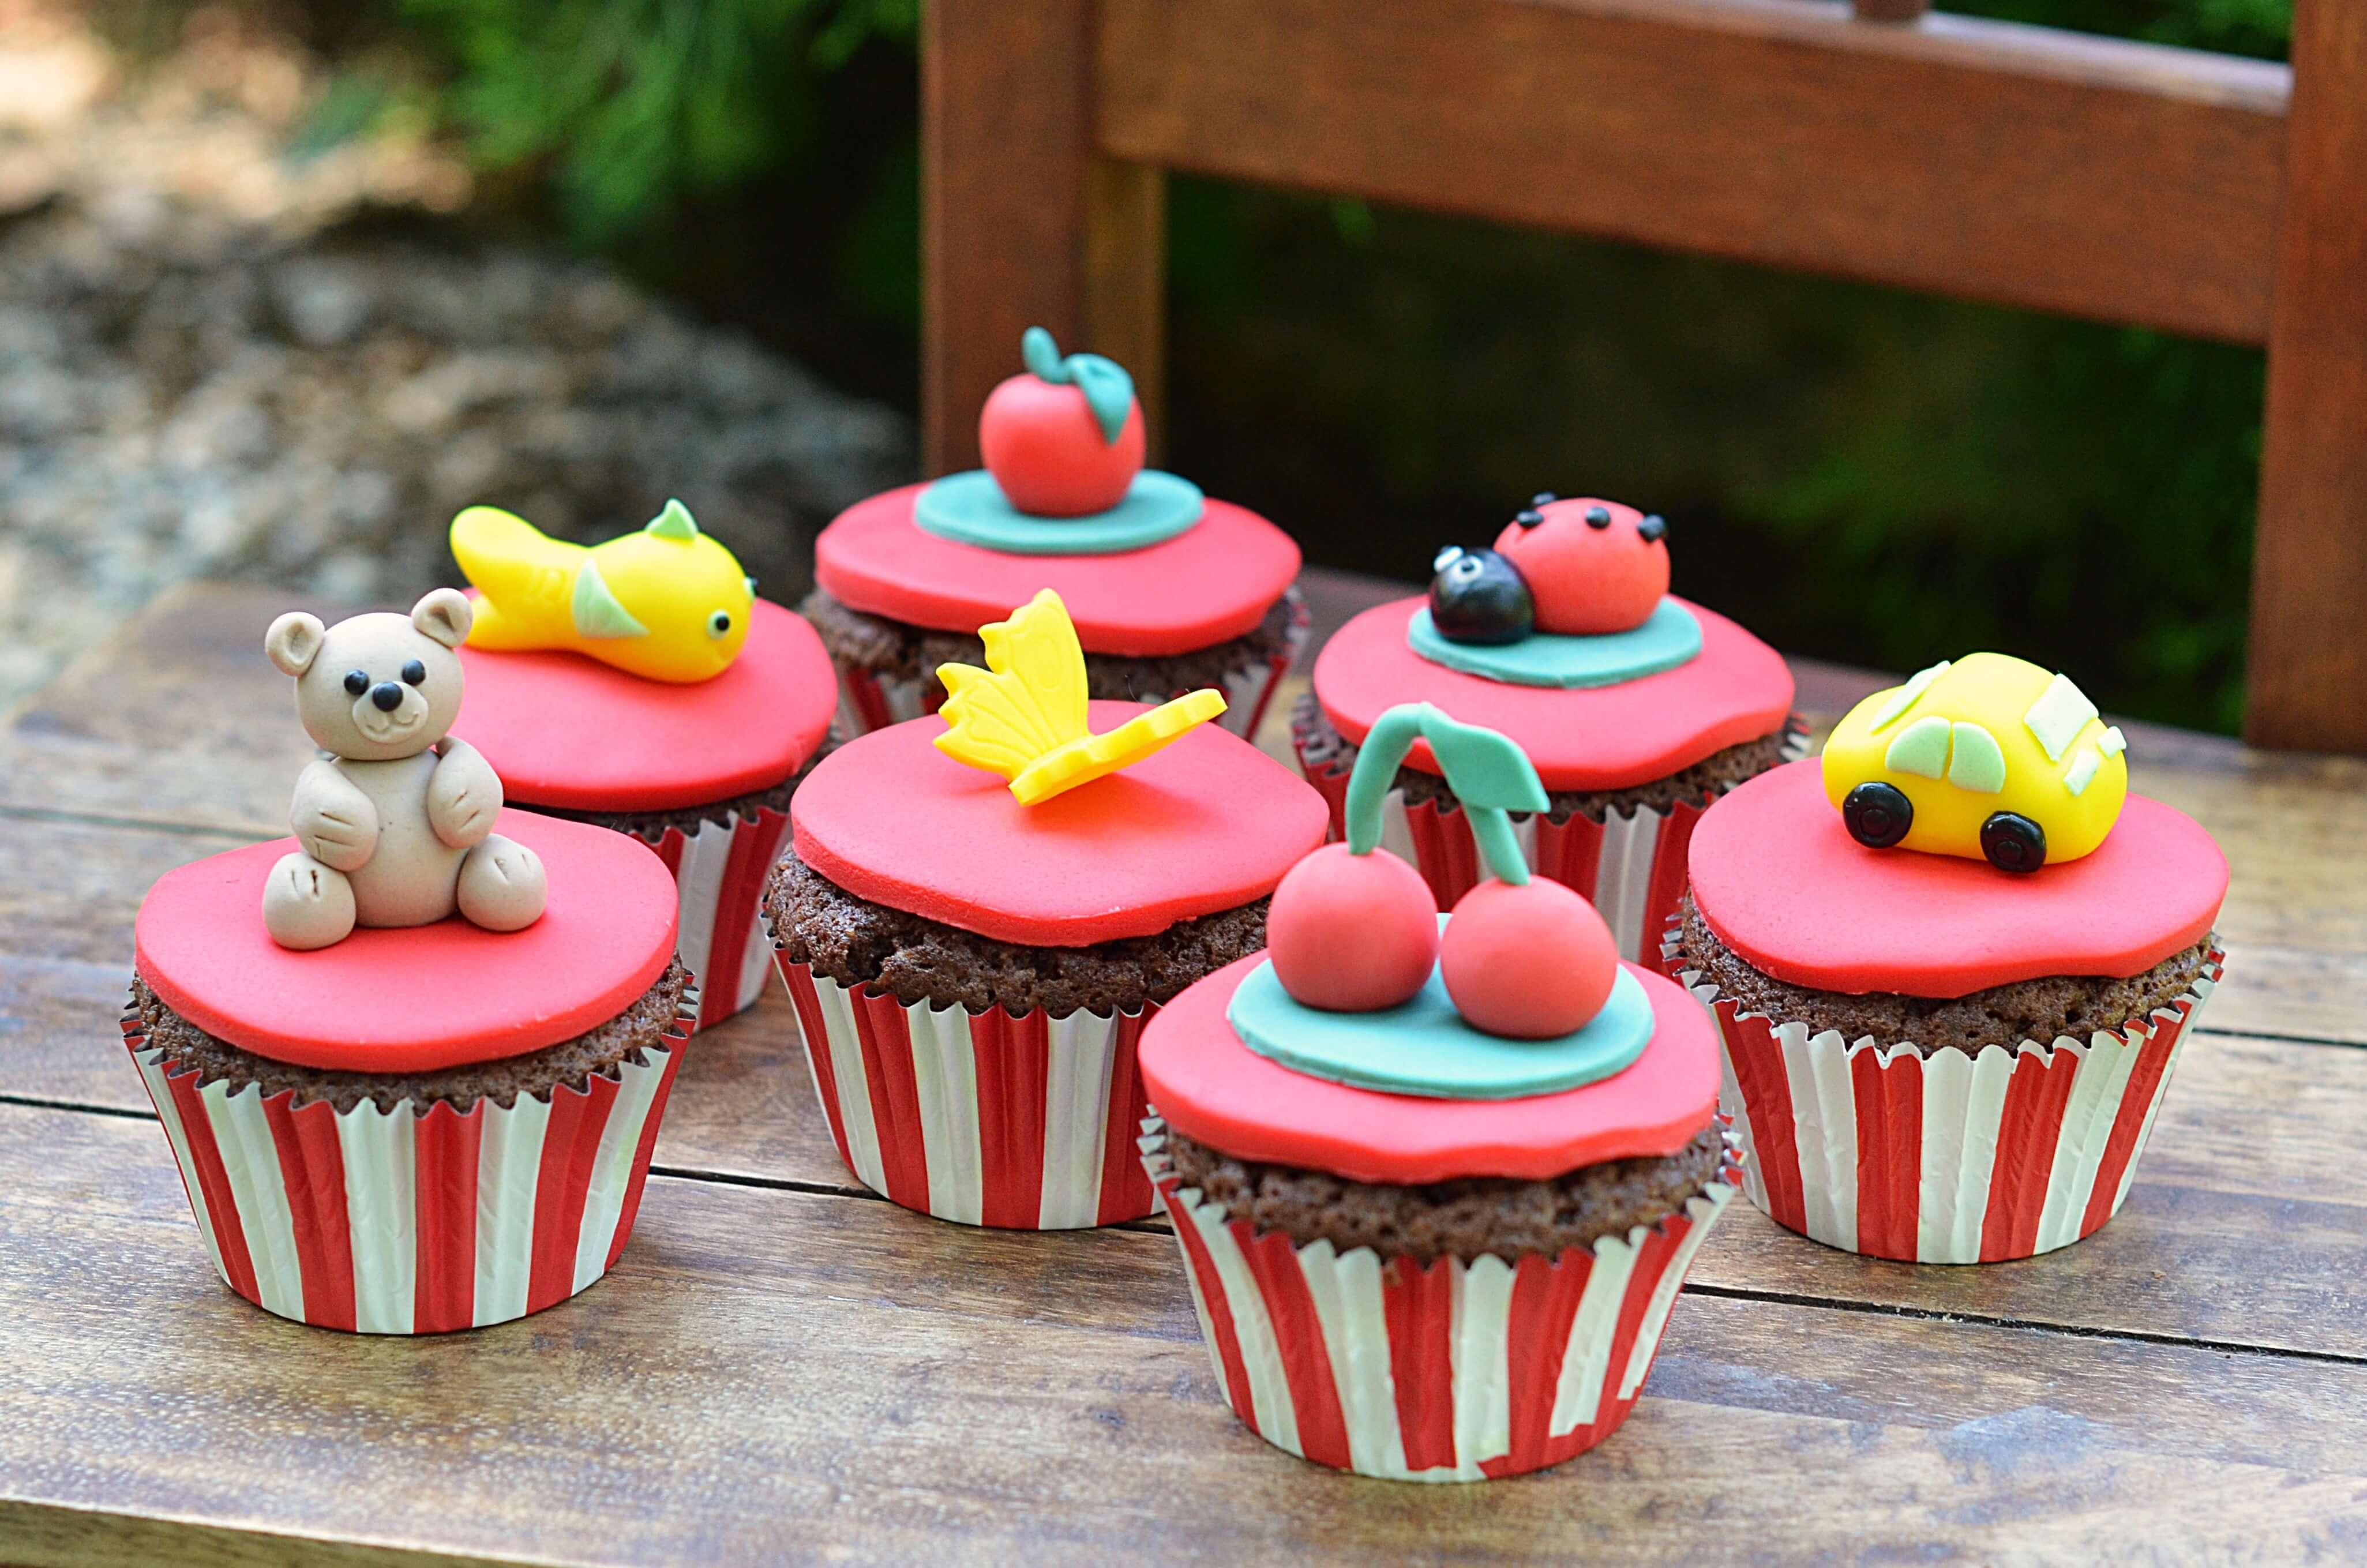 ovis ballagási cupcake - kakaós-meggyes muffin recept óvodai ballagásra